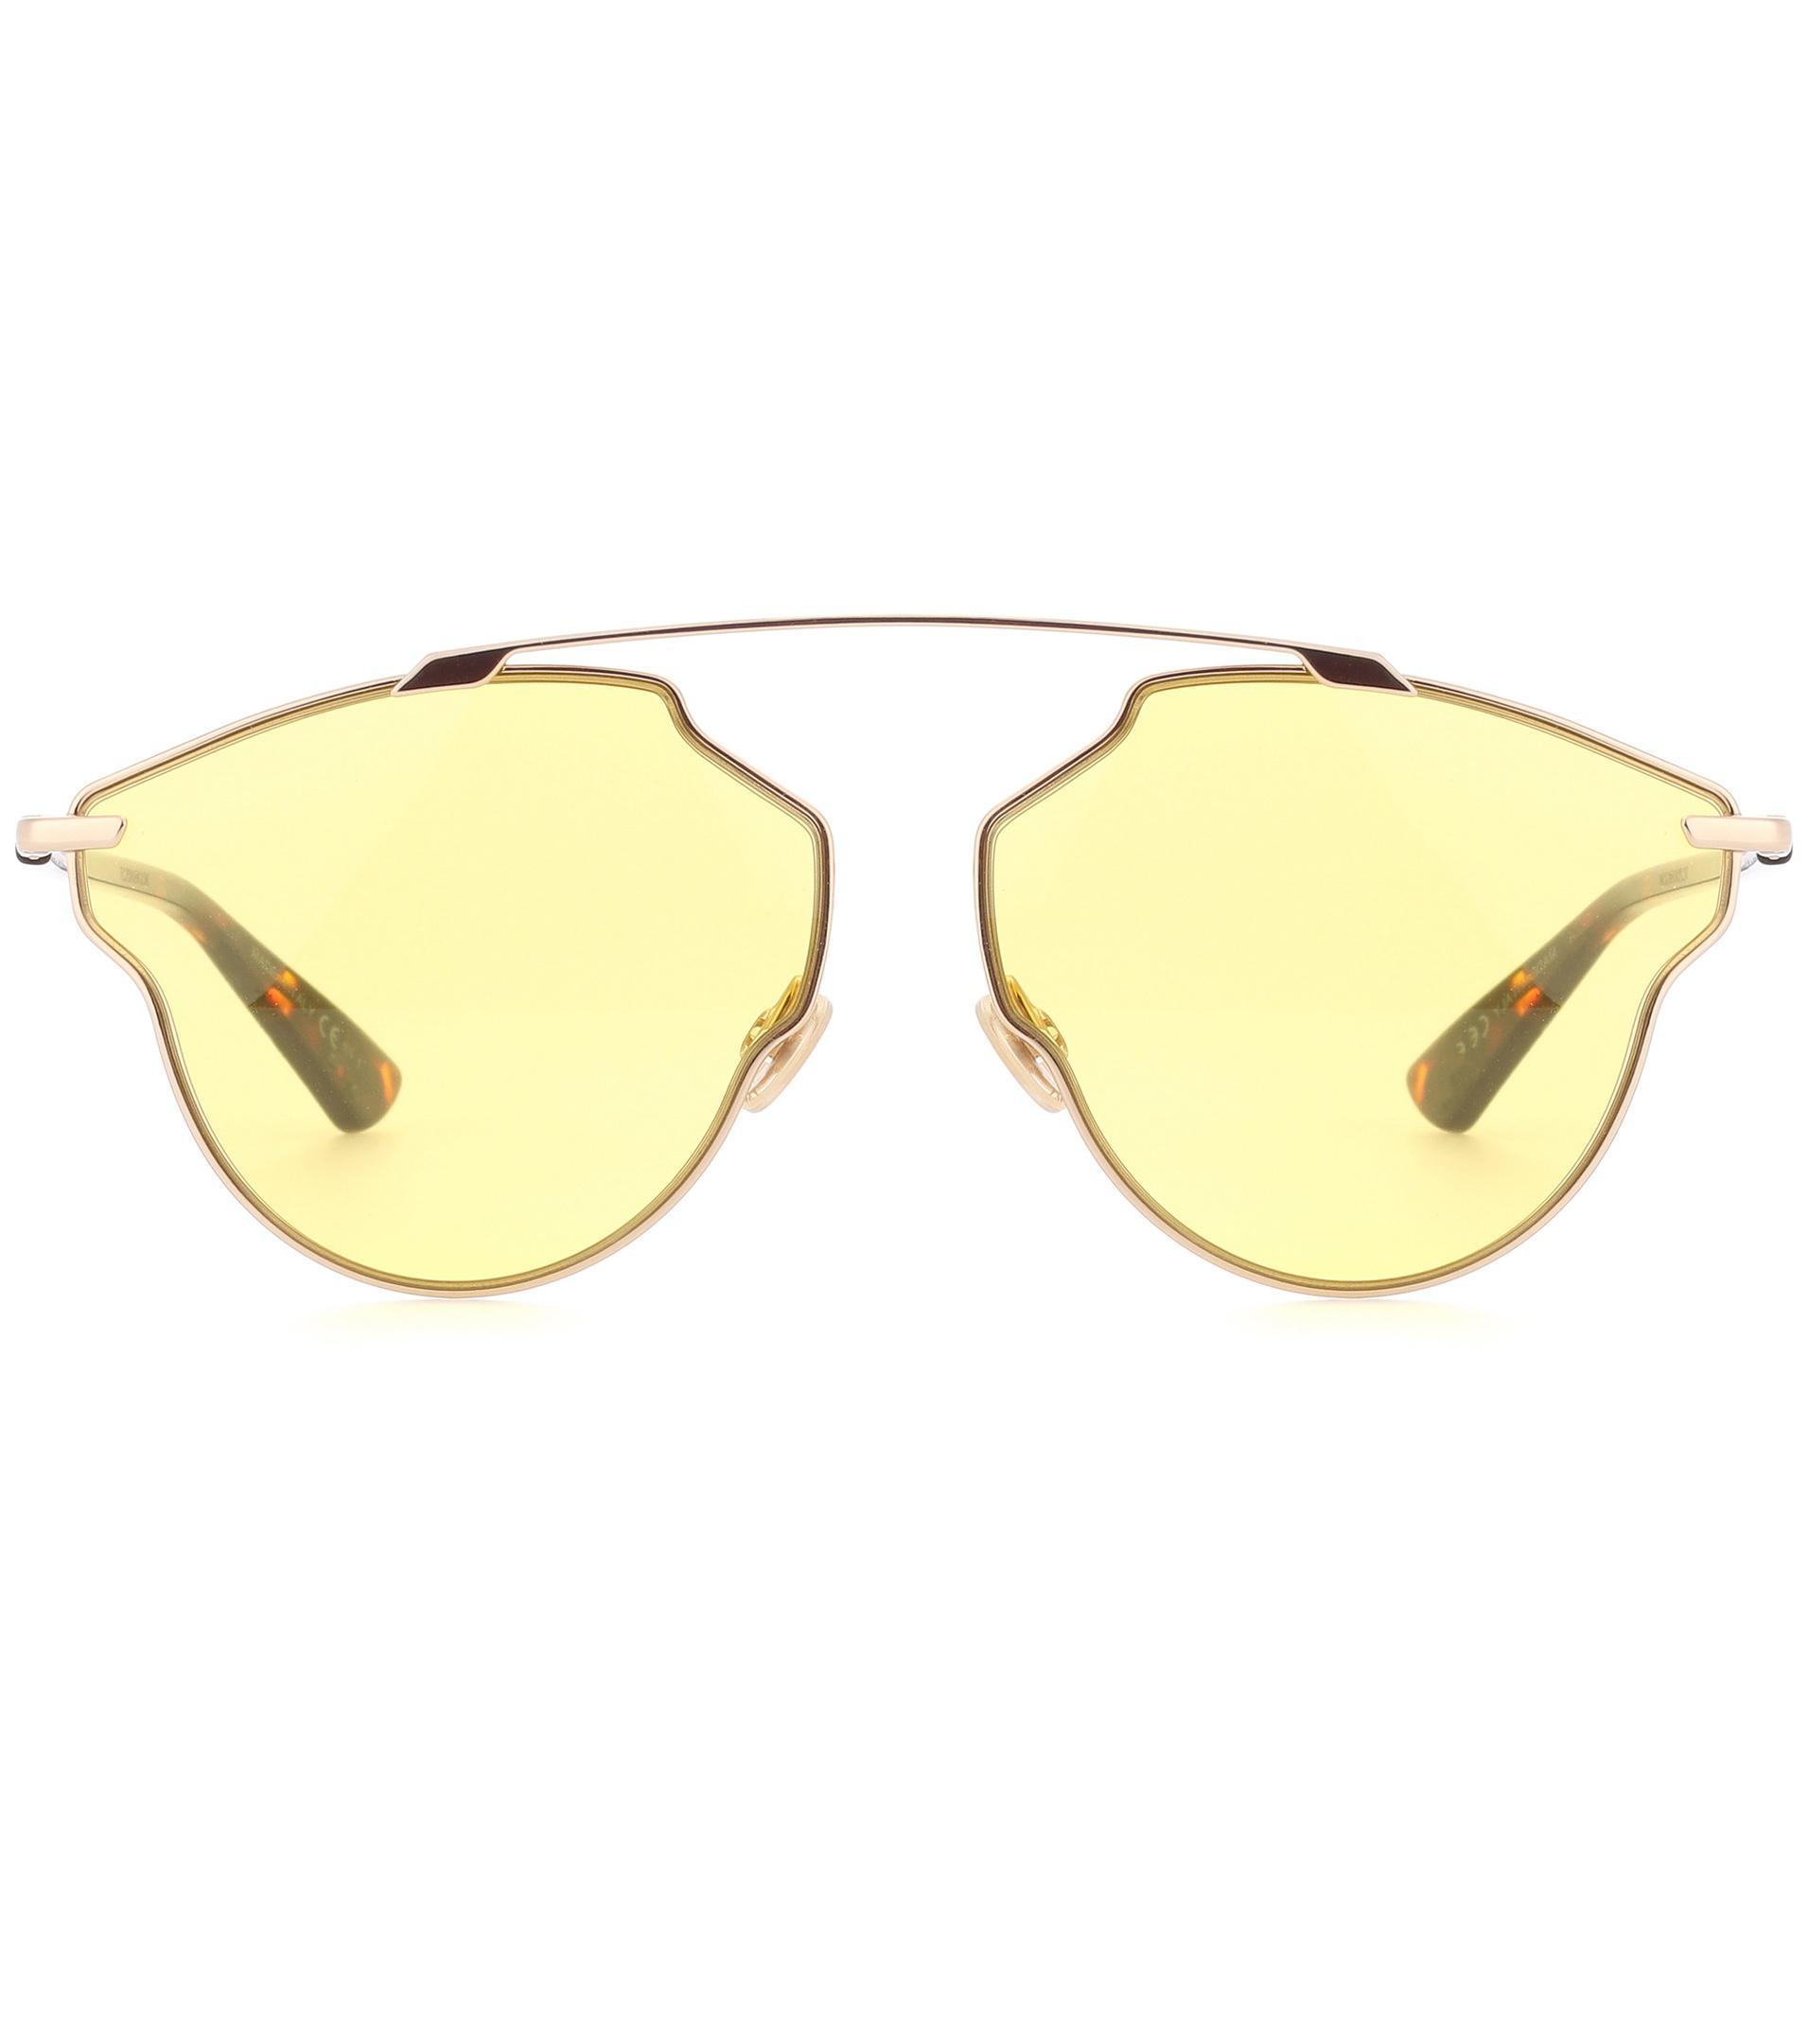 441b9e58a5 Dior Dior So Real Pop Sunglasses in Yellow - Lyst